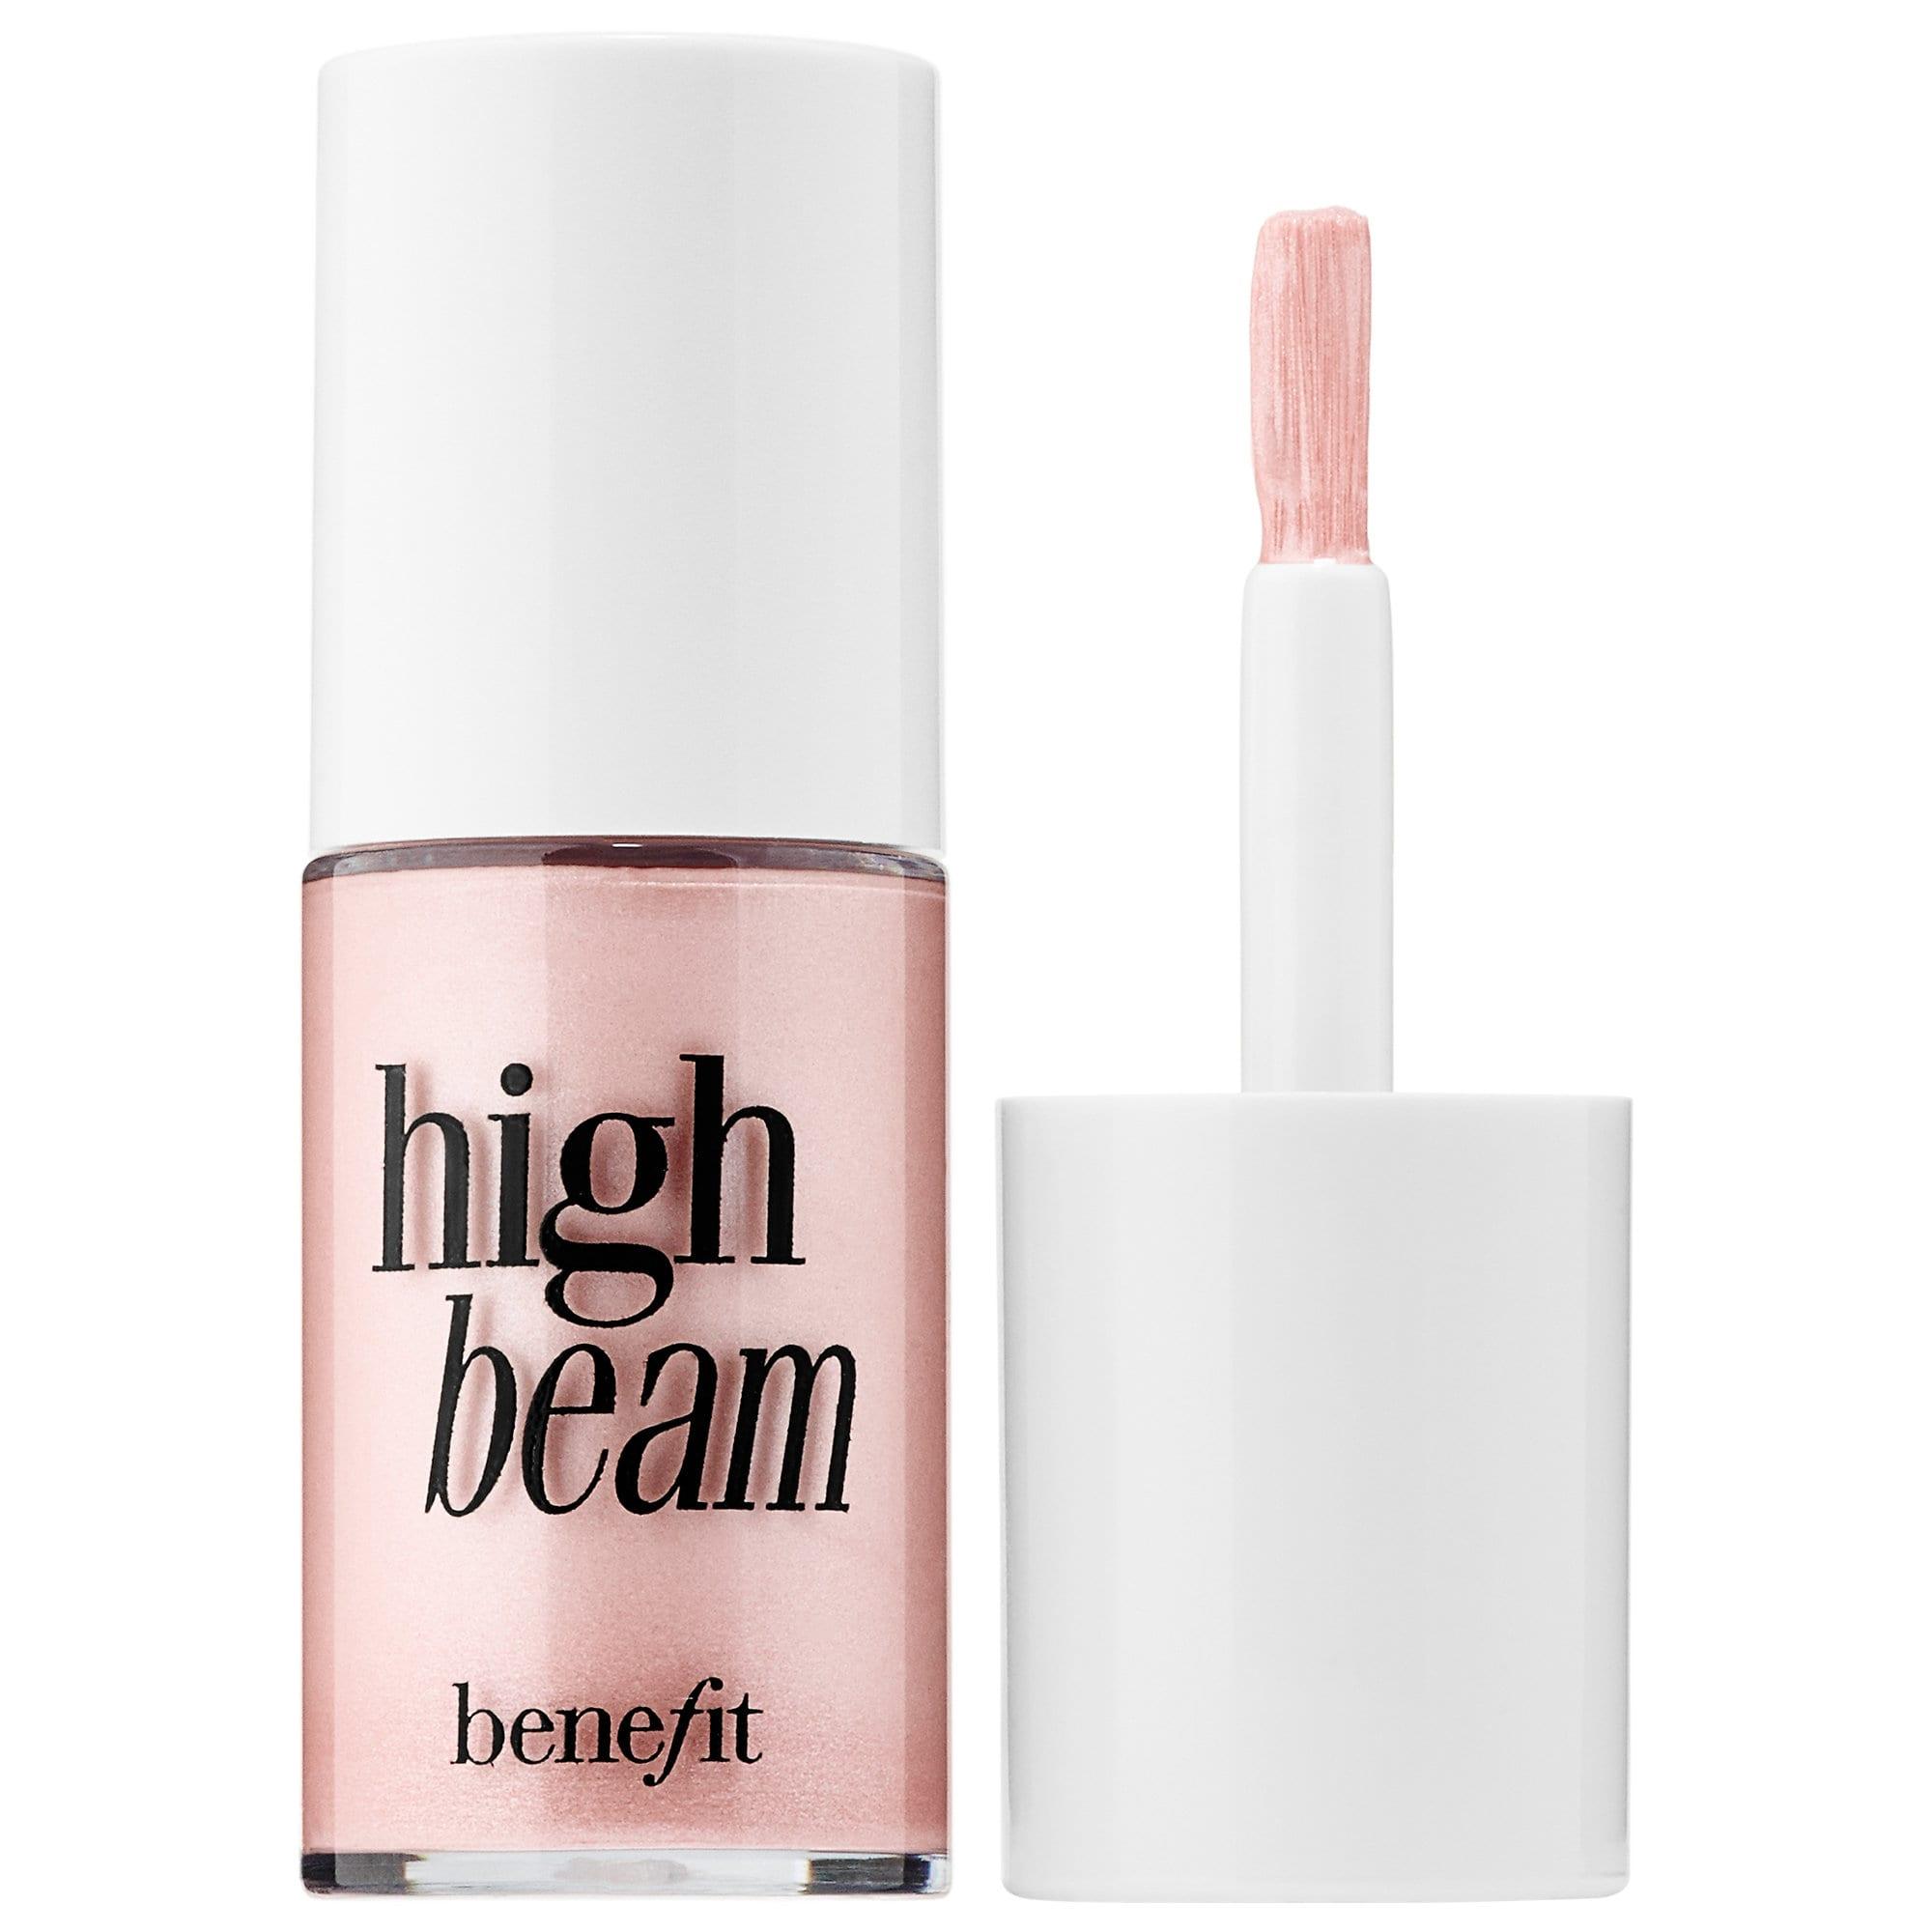 benefit high beam